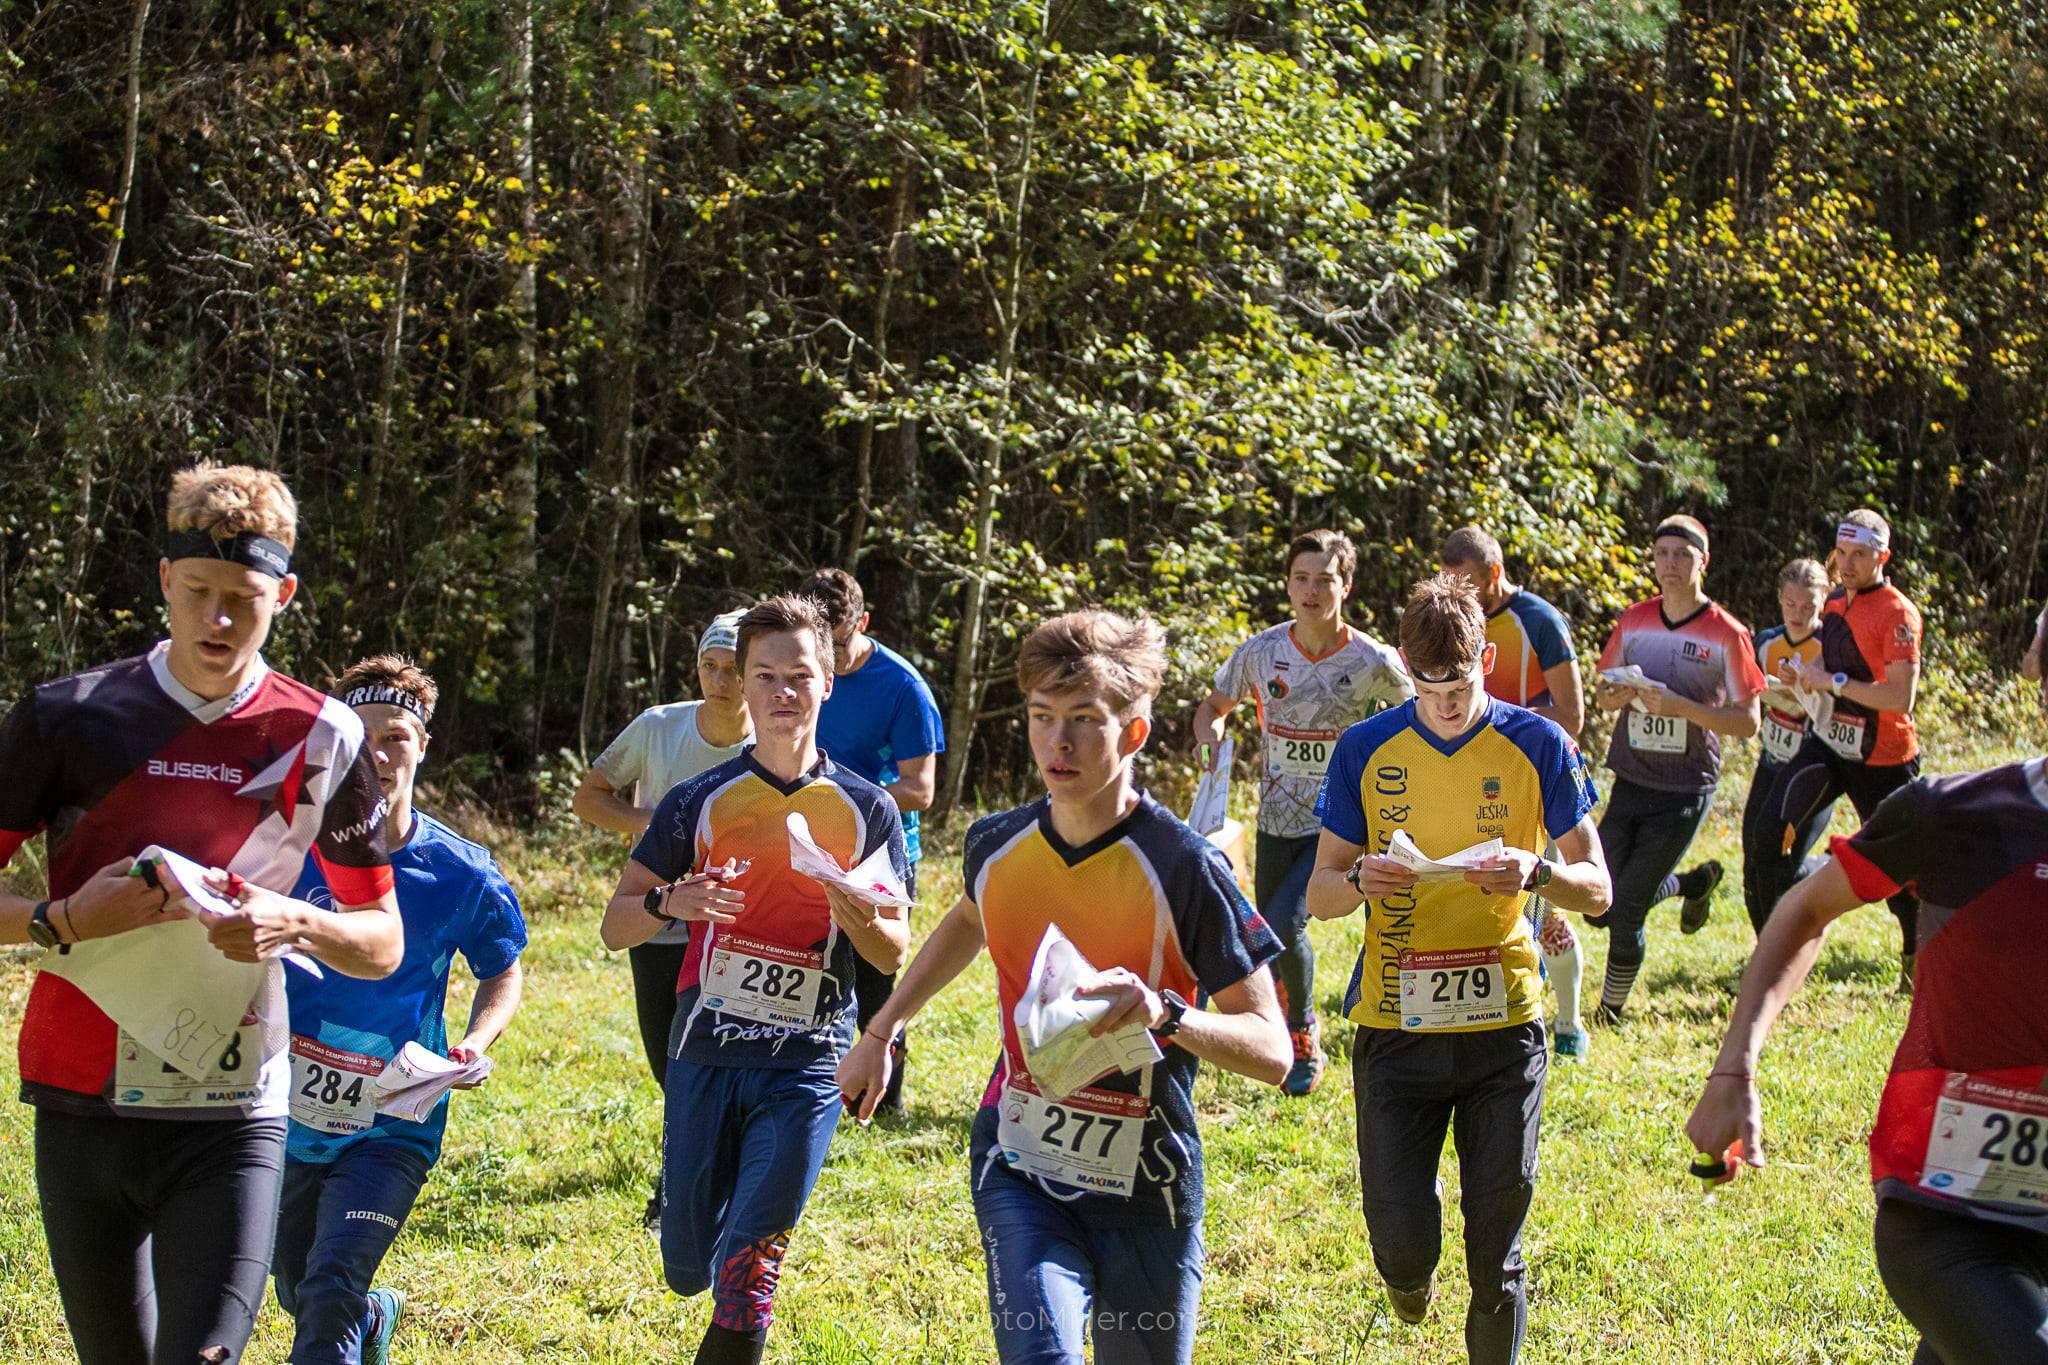 maratons-startts-1.jpg